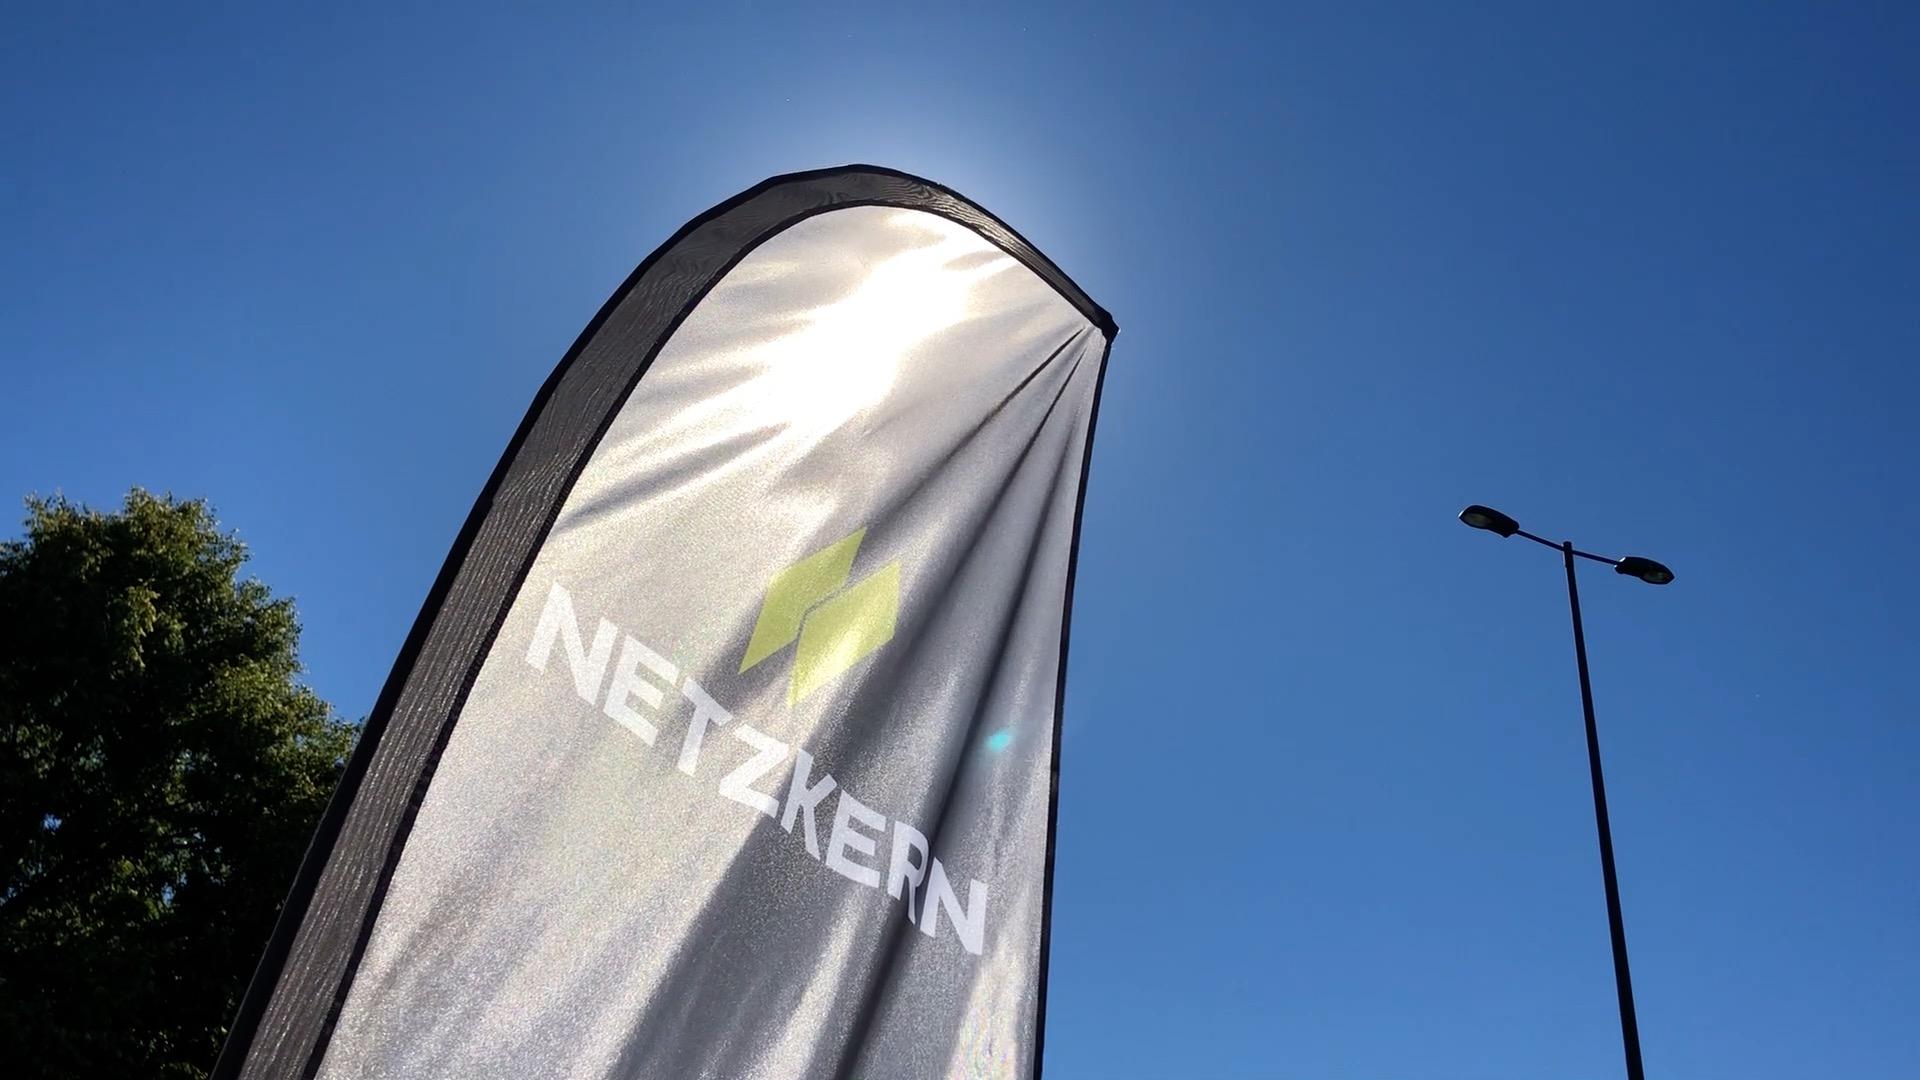 netzkern Standflagge mit neuem Logo